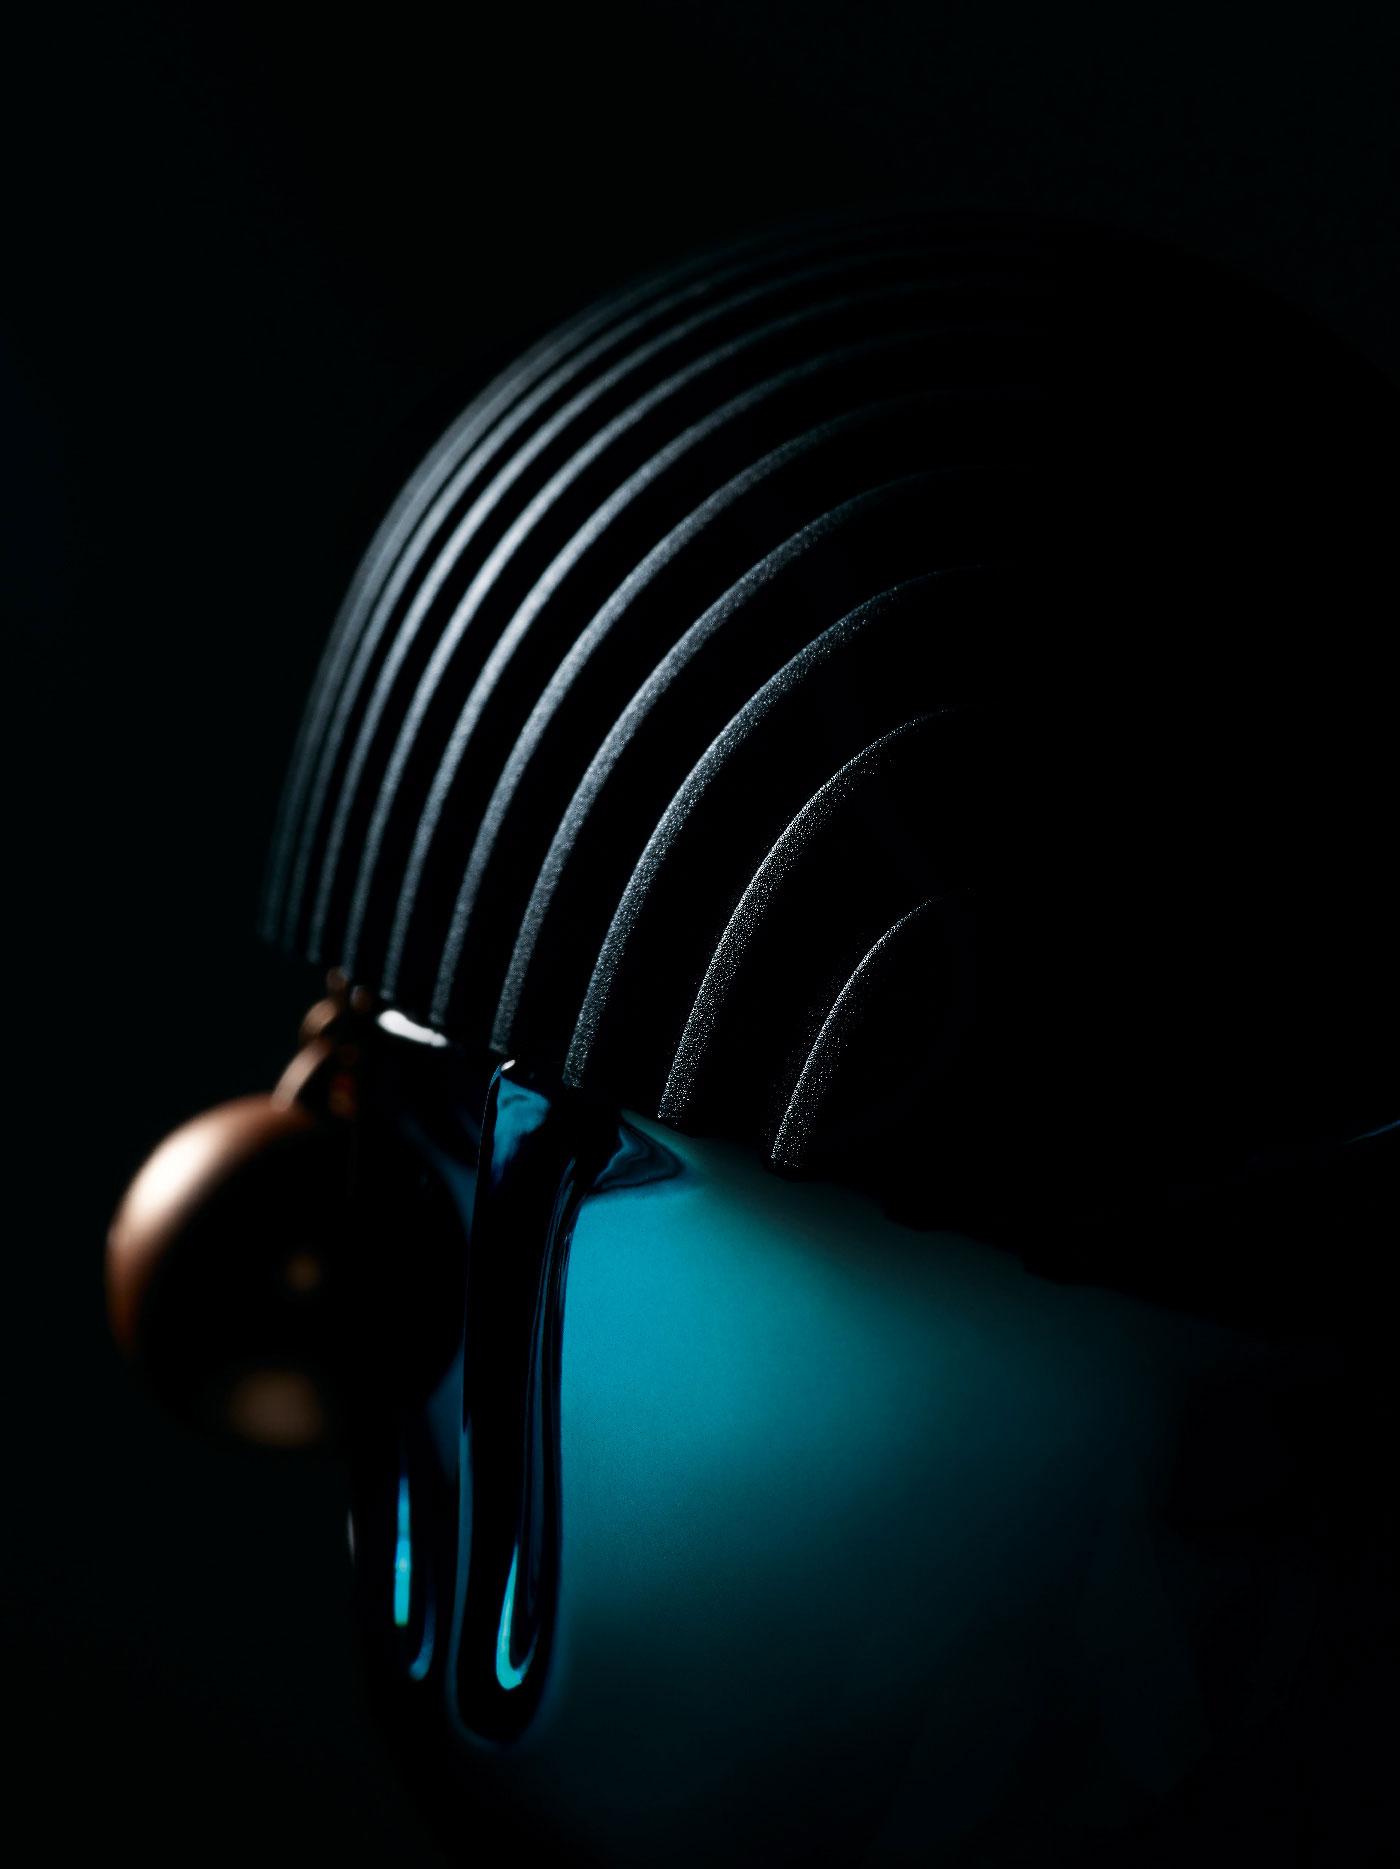 kenzo world intense new fragrances. Black Bedroom Furniture Sets. Home Design Ideas